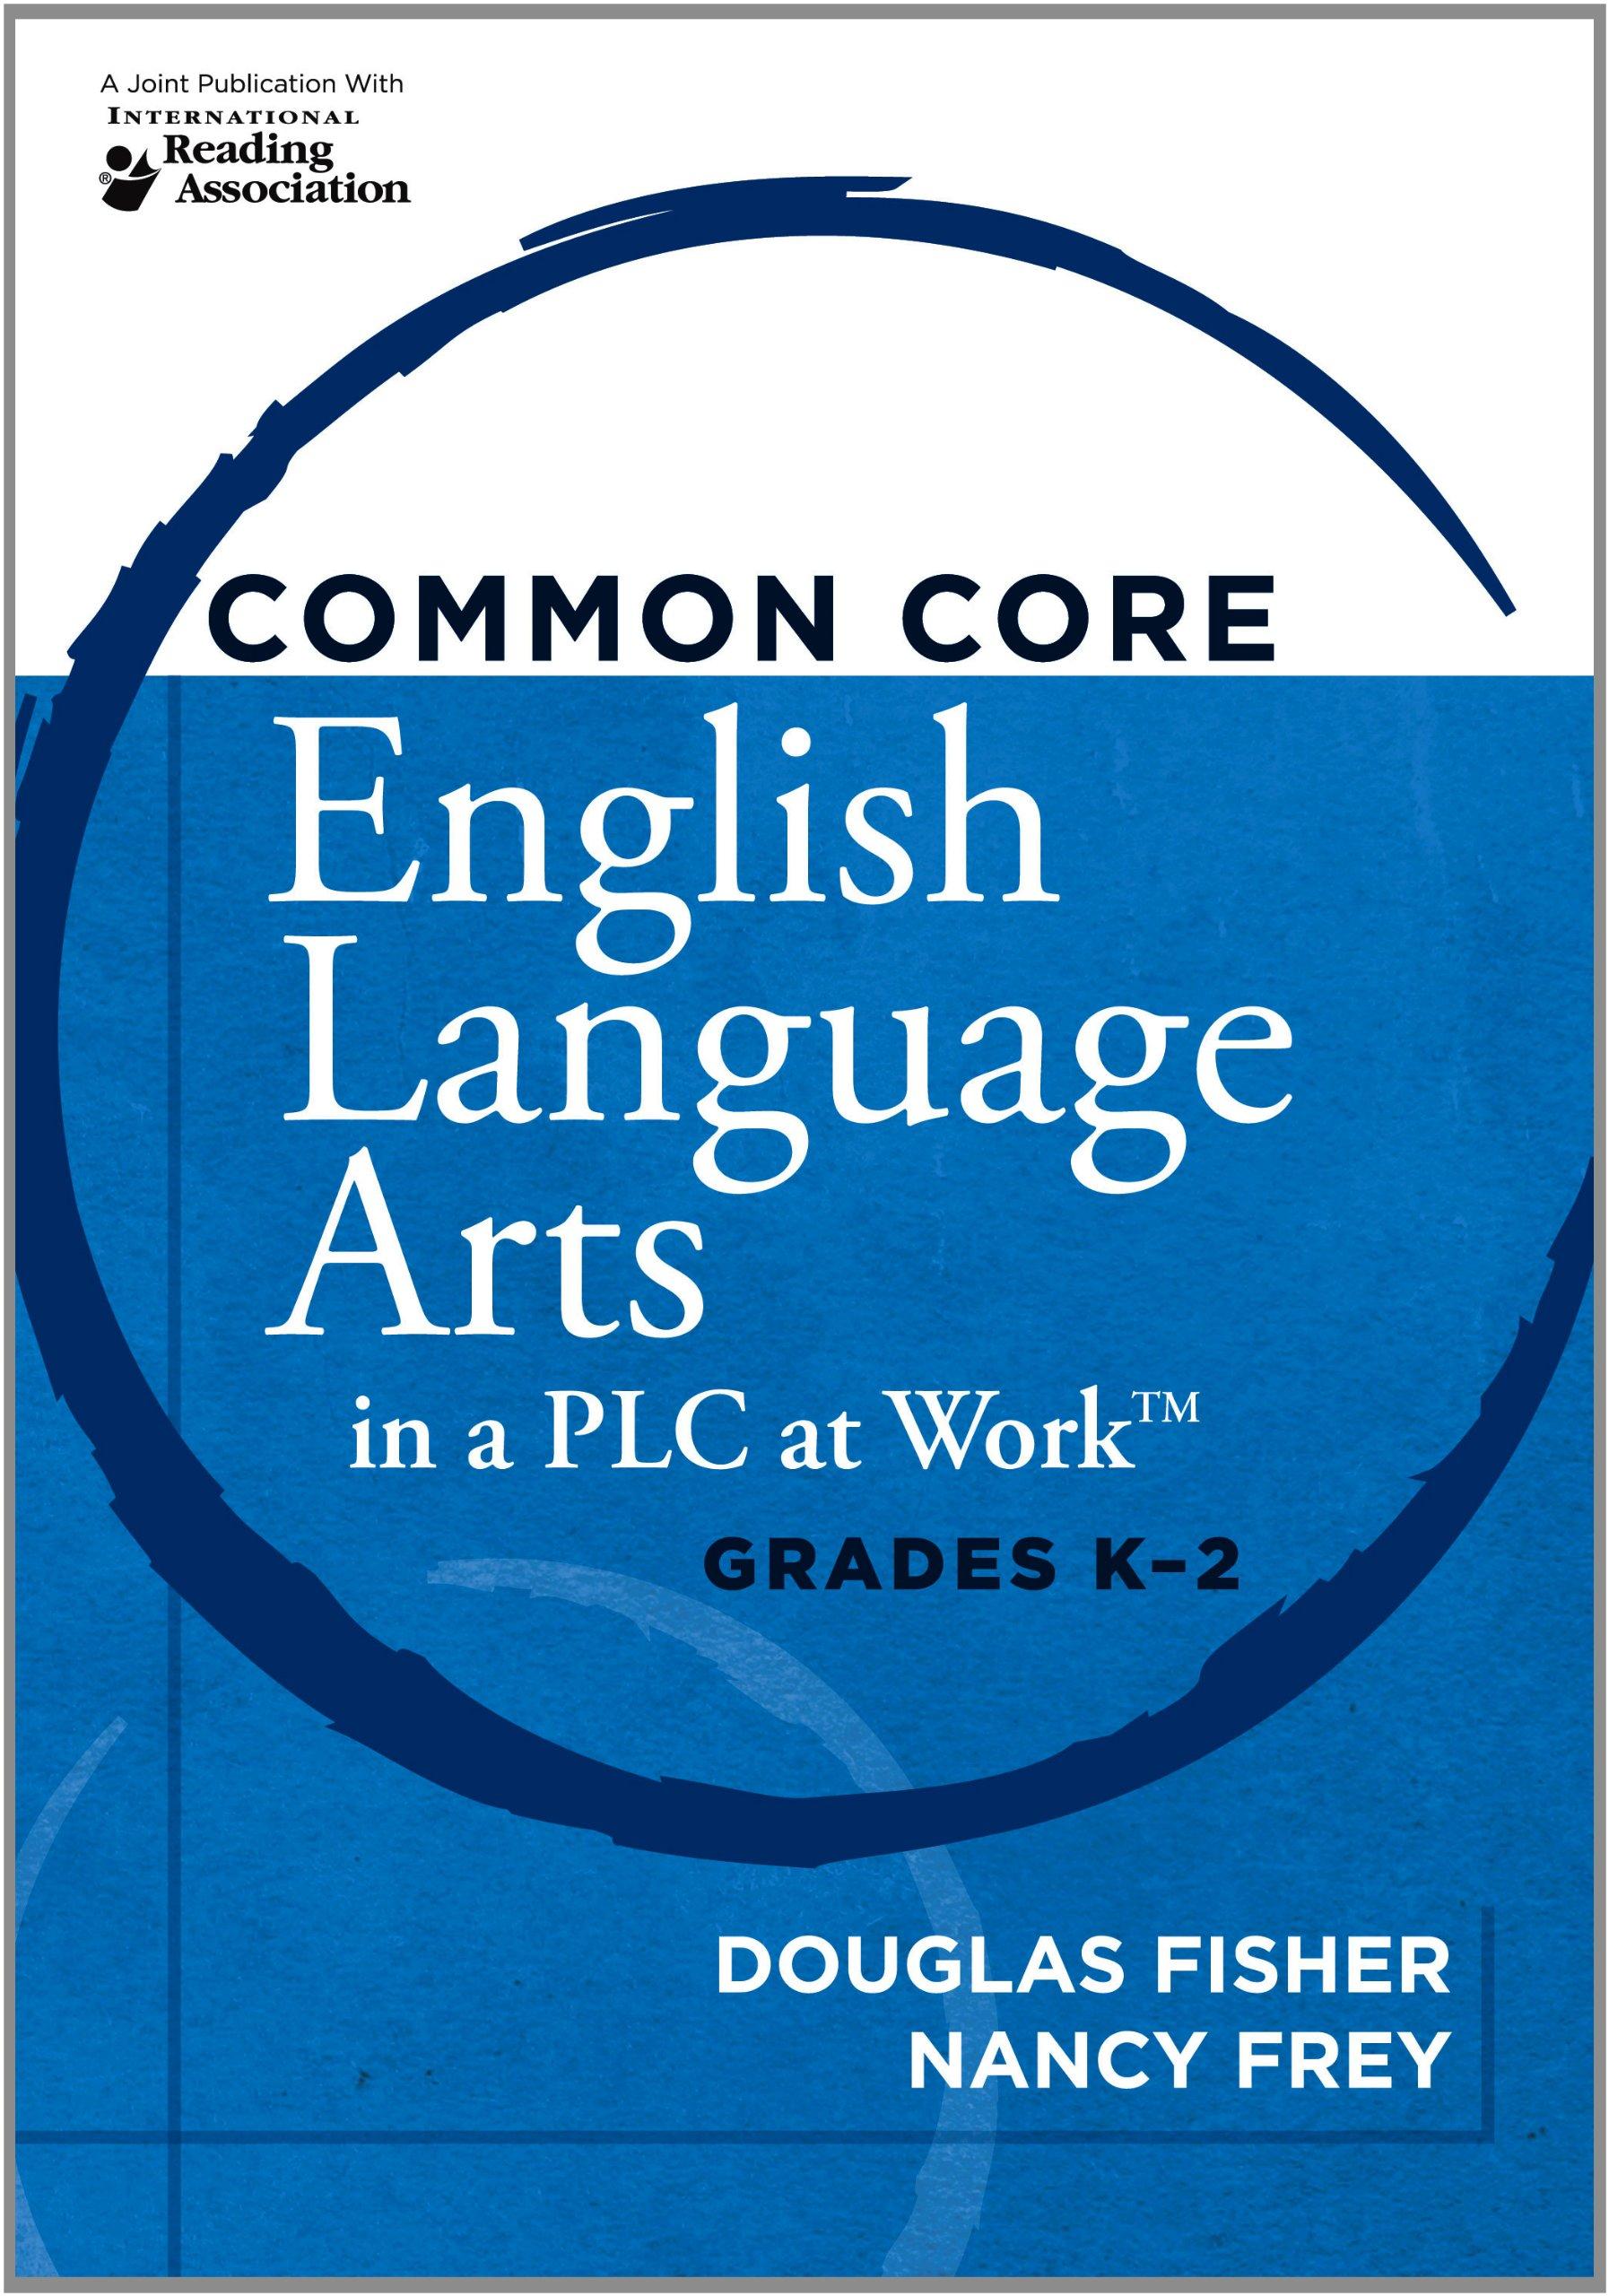 Amazon.com: Common Core English Language Arts in a PLC at Work ...